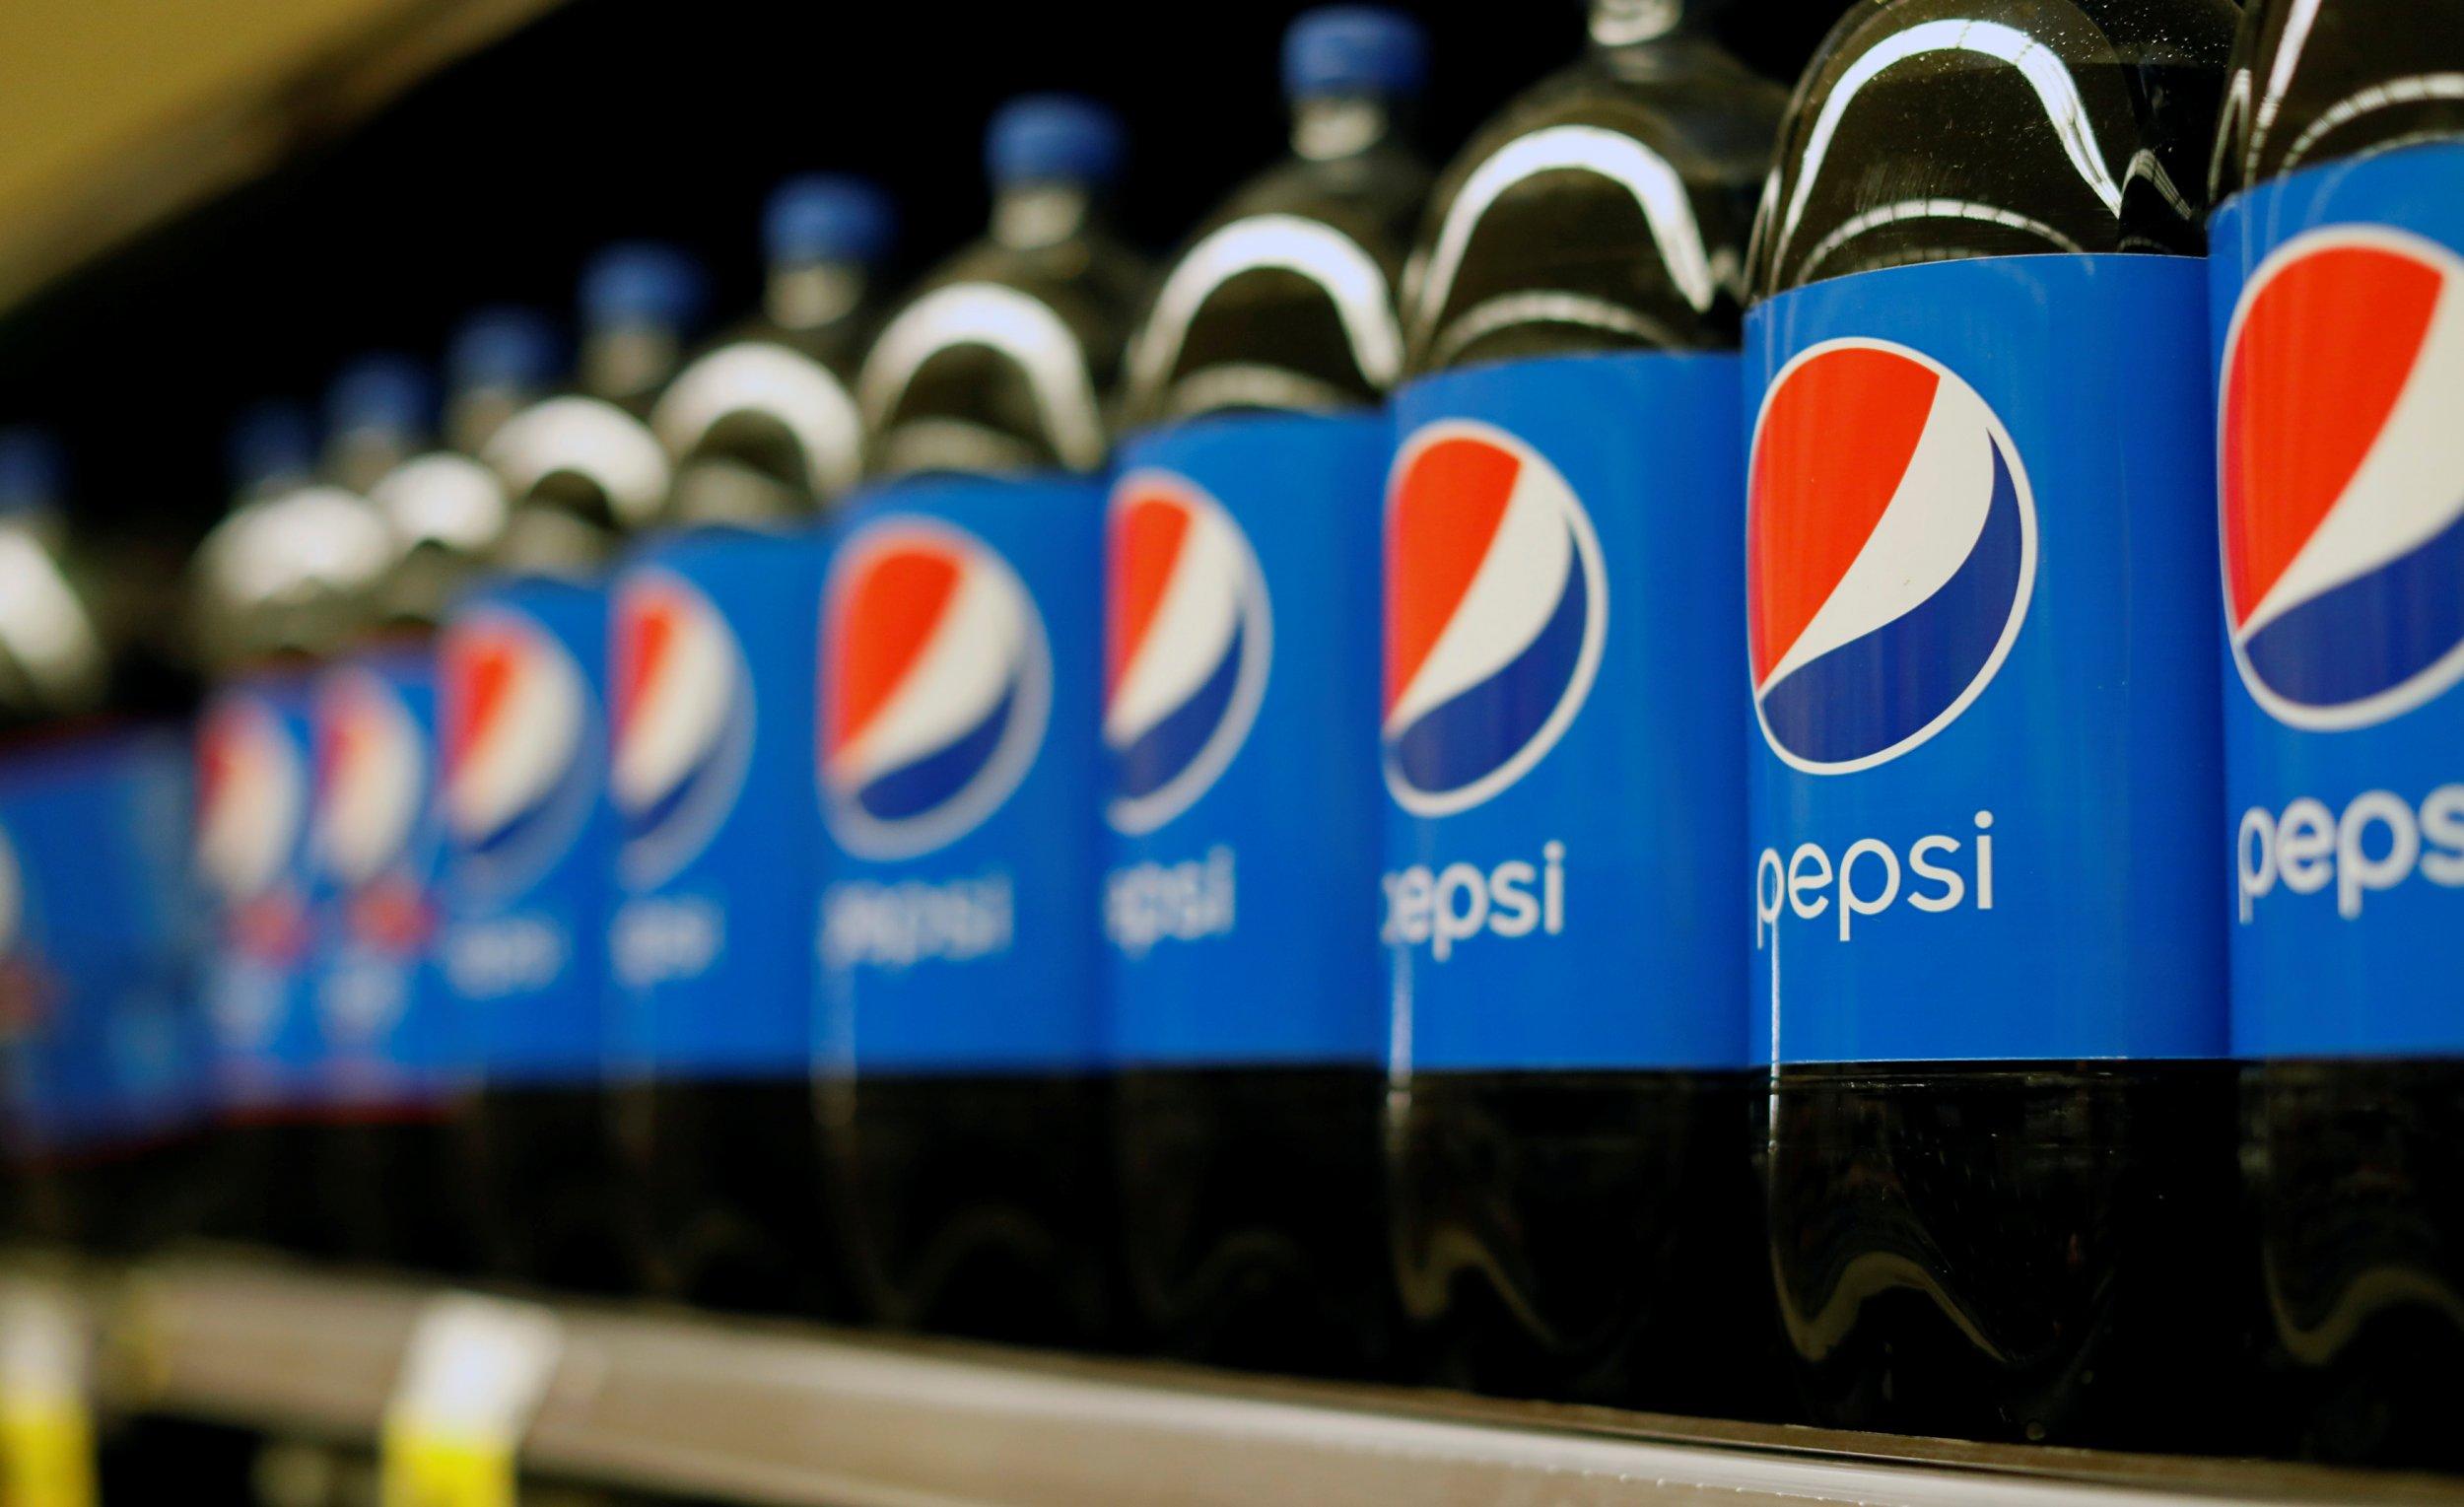 12_05_Pepsi_Russia